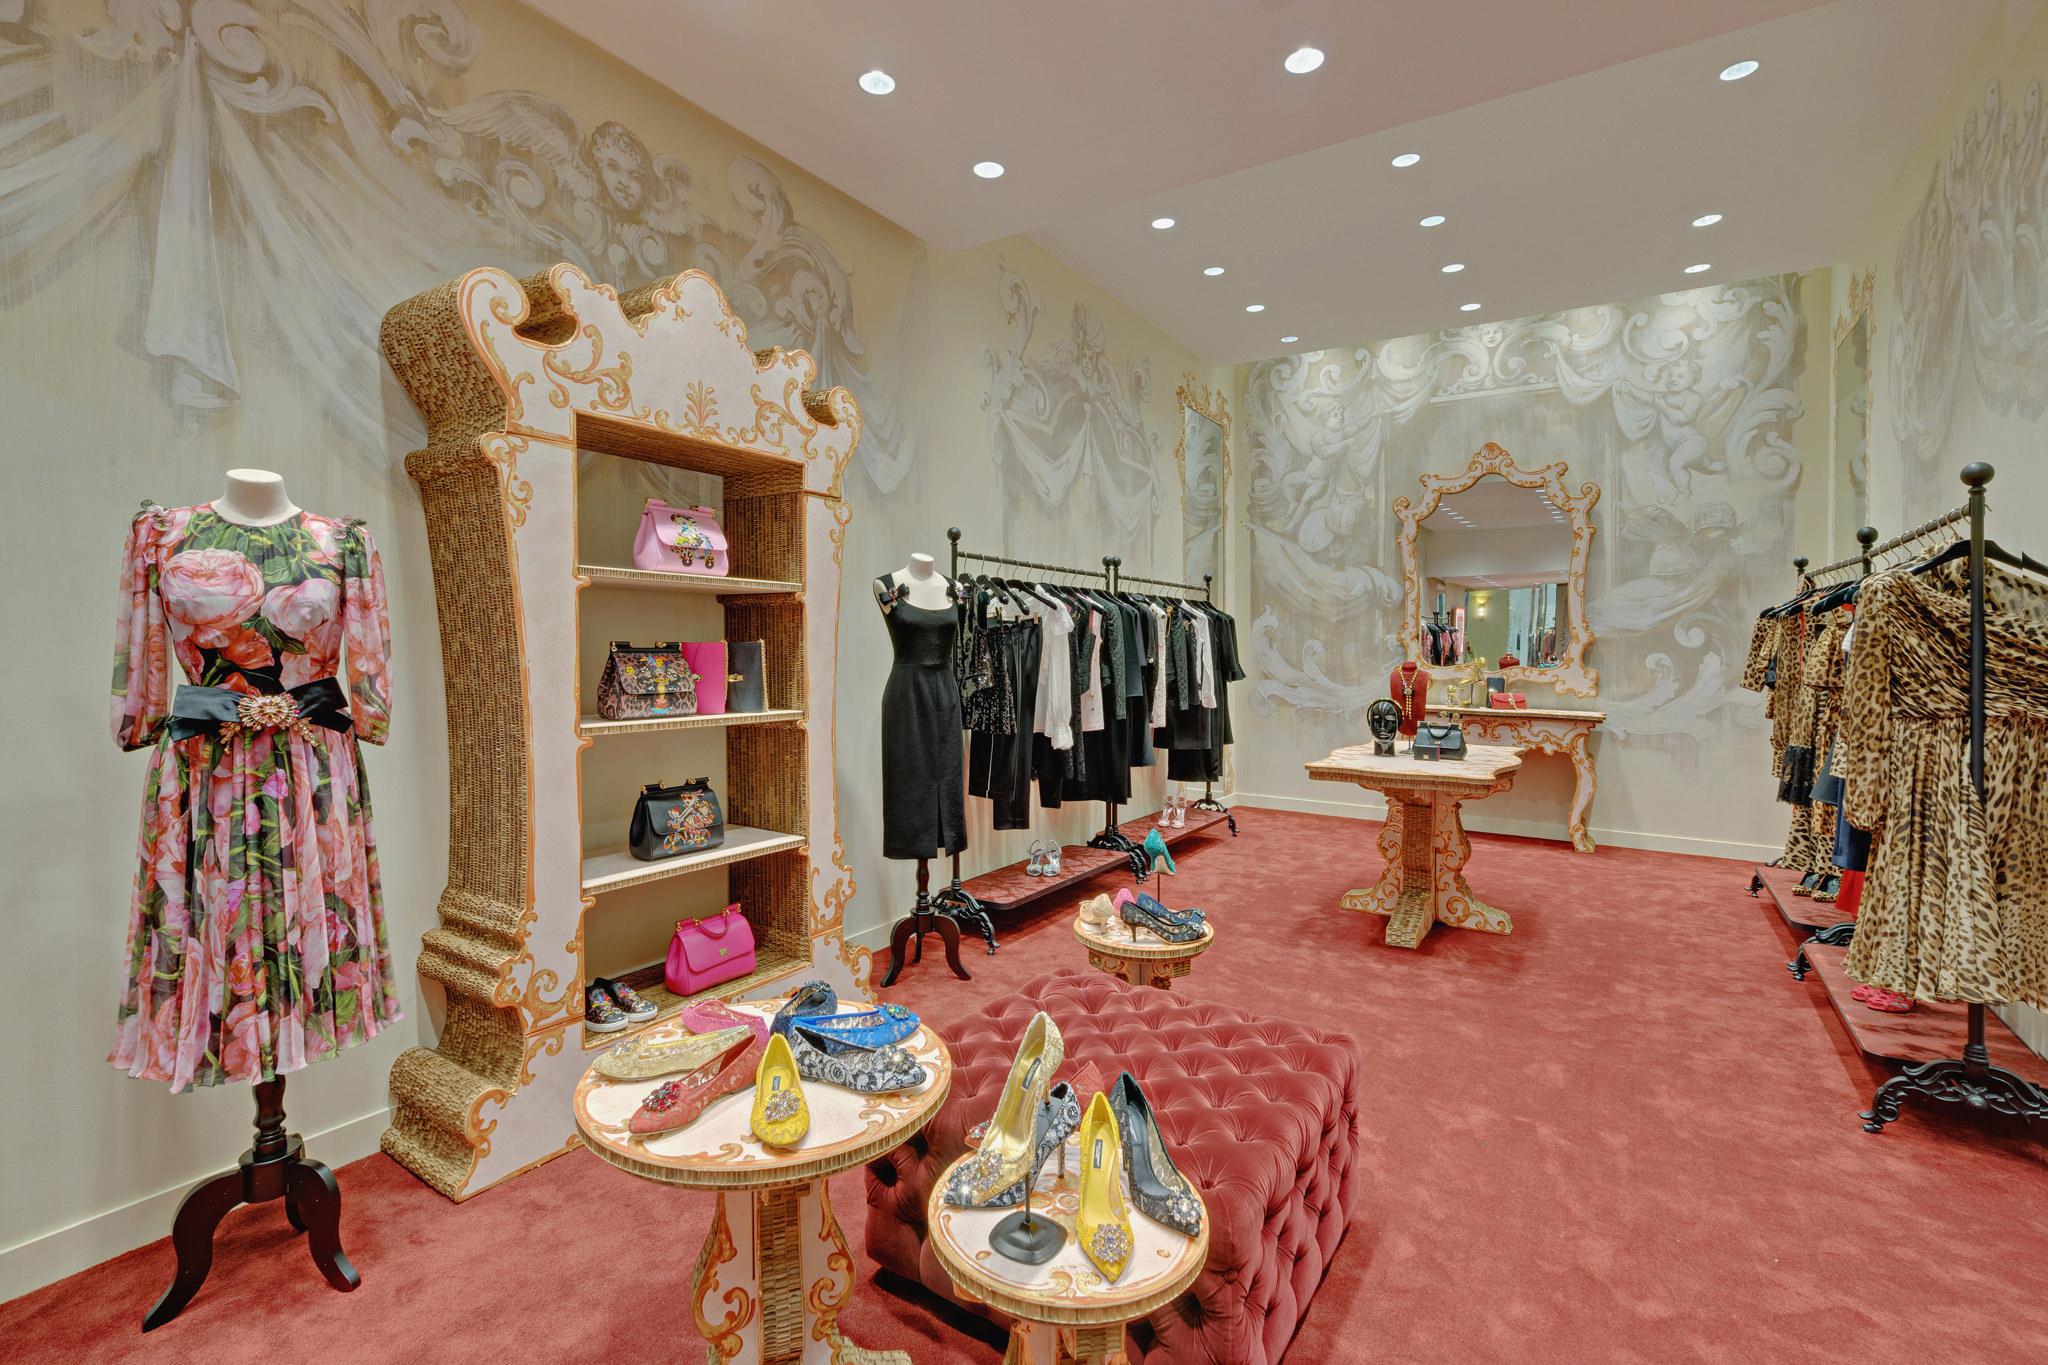 20170123 - Dolce & Gabbana - HCM - Commercial - Interior - Store - Retouch 0003.jpg